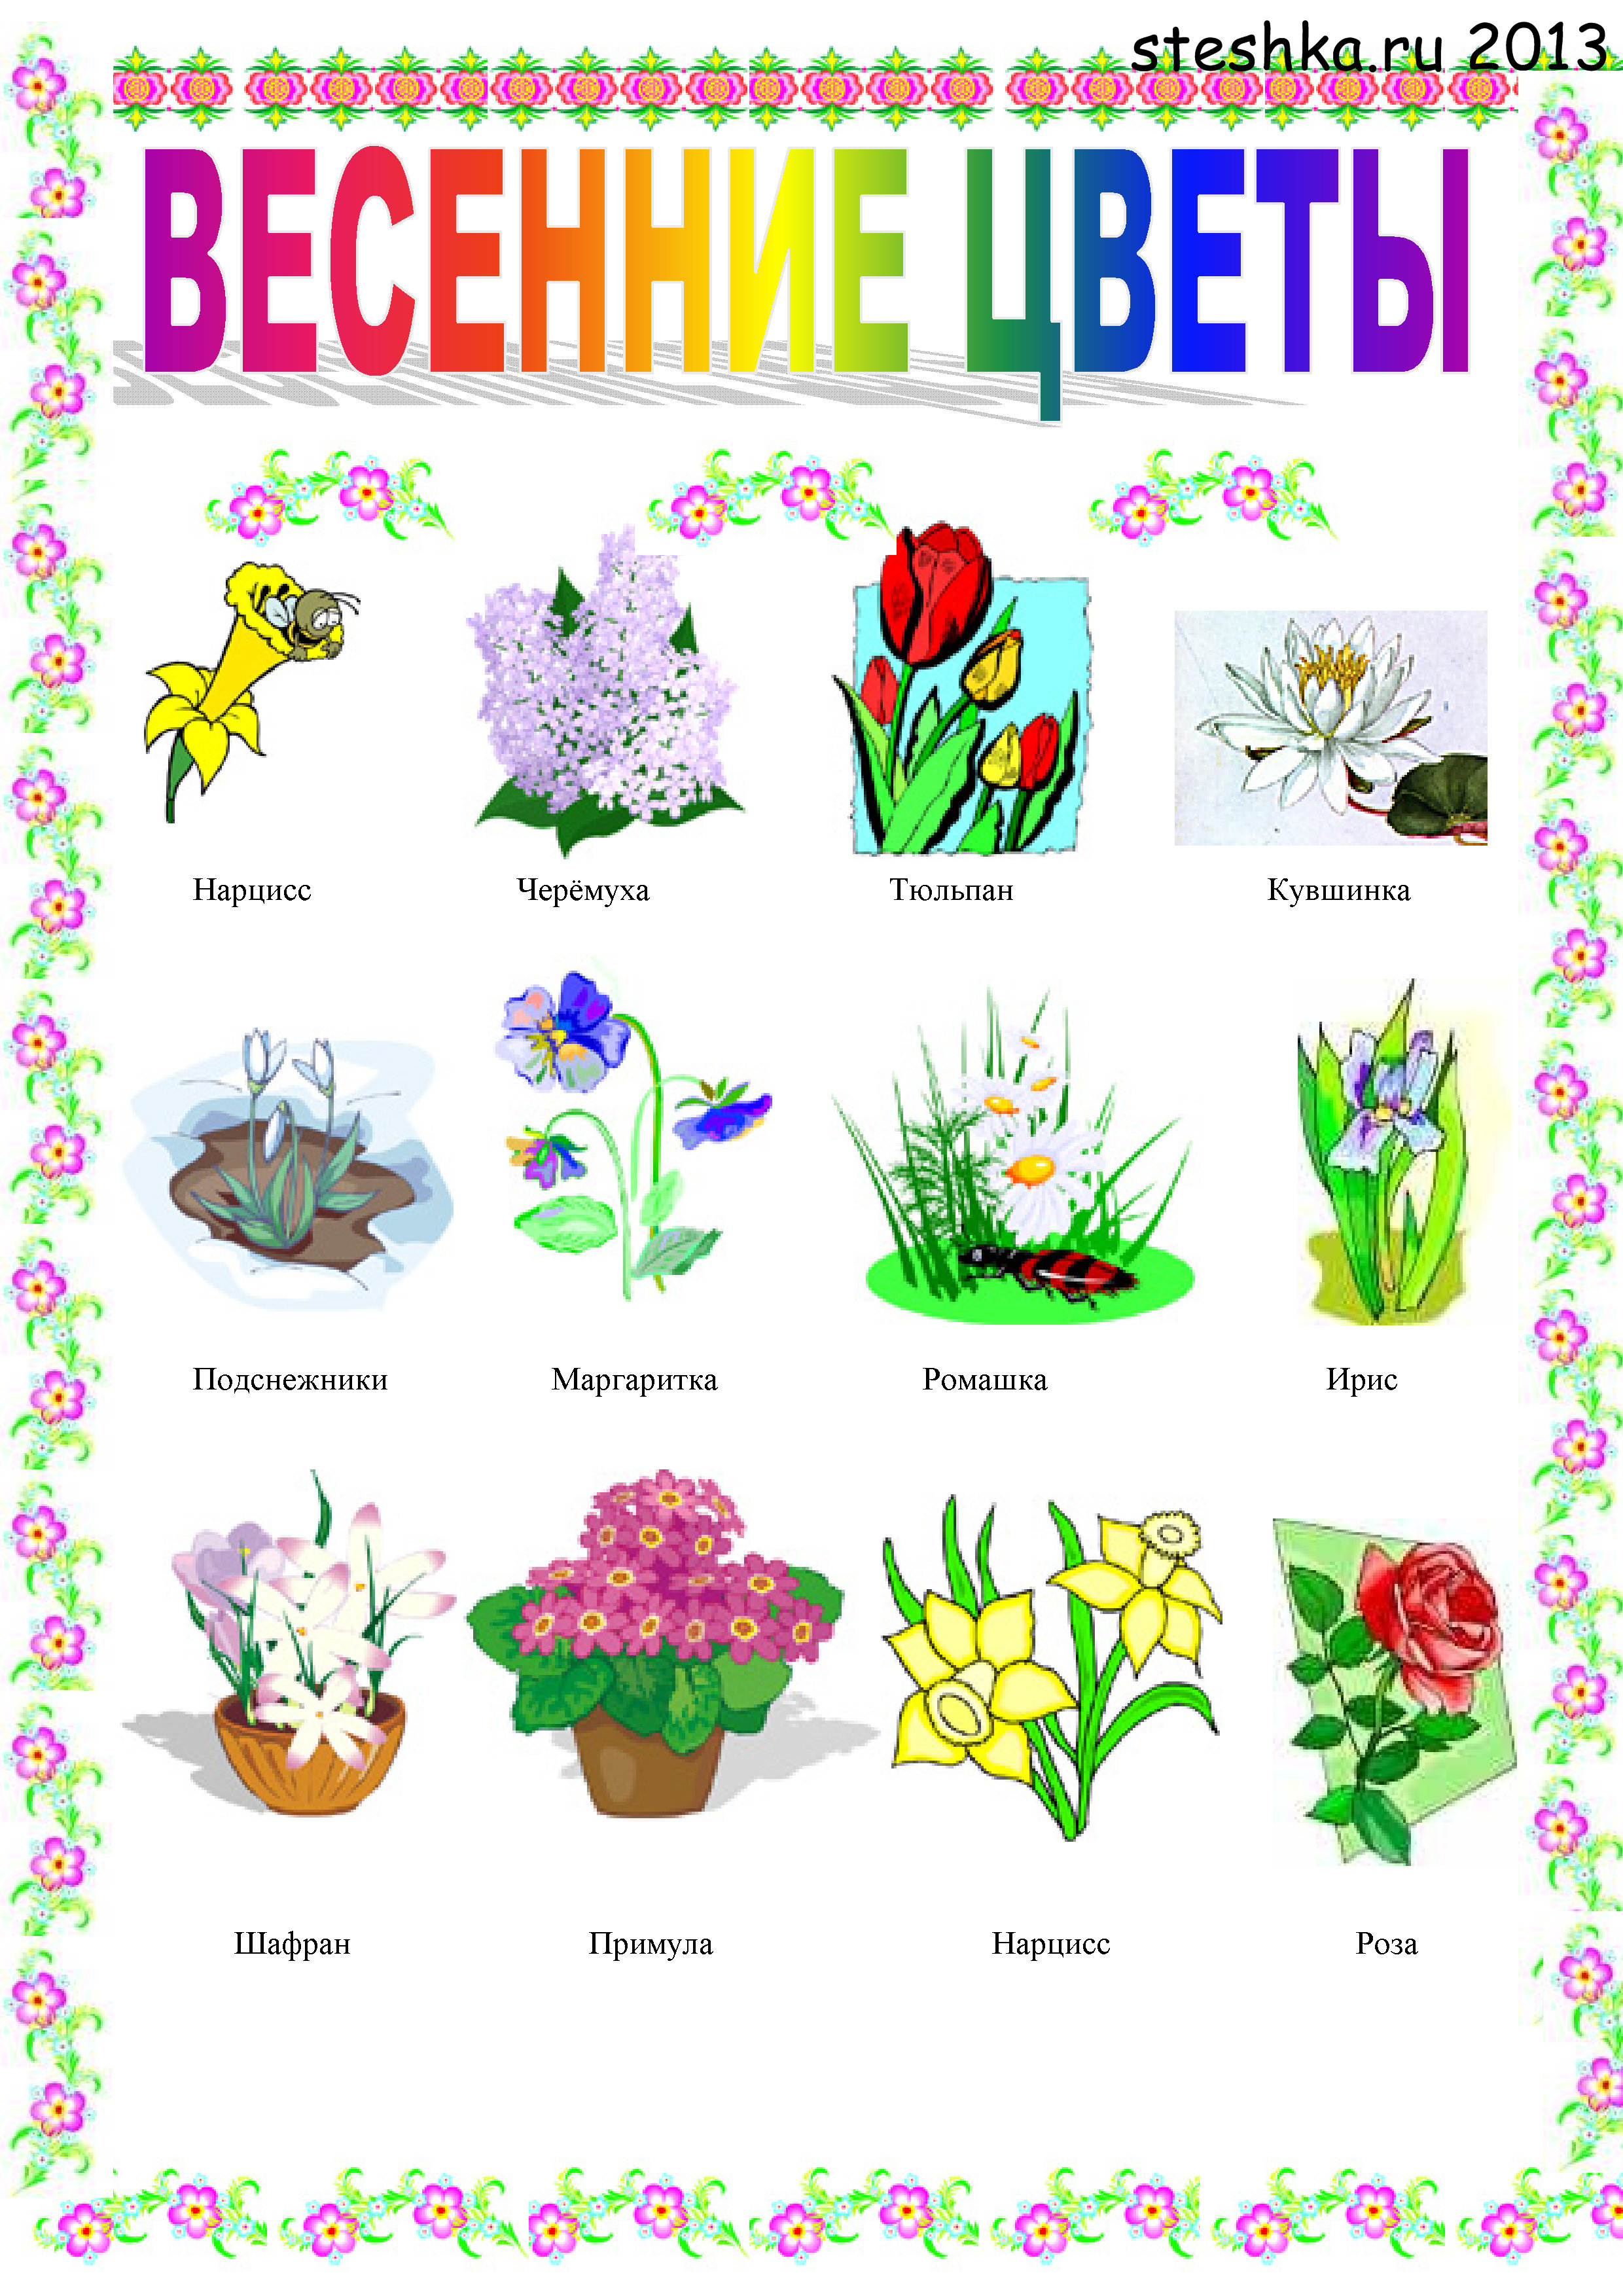 Кликните на картинку, чтобы увидеть её ...: dreempics.com/flowers/1526-kartinki_poleveh_tsvetov_dlya_detey.html